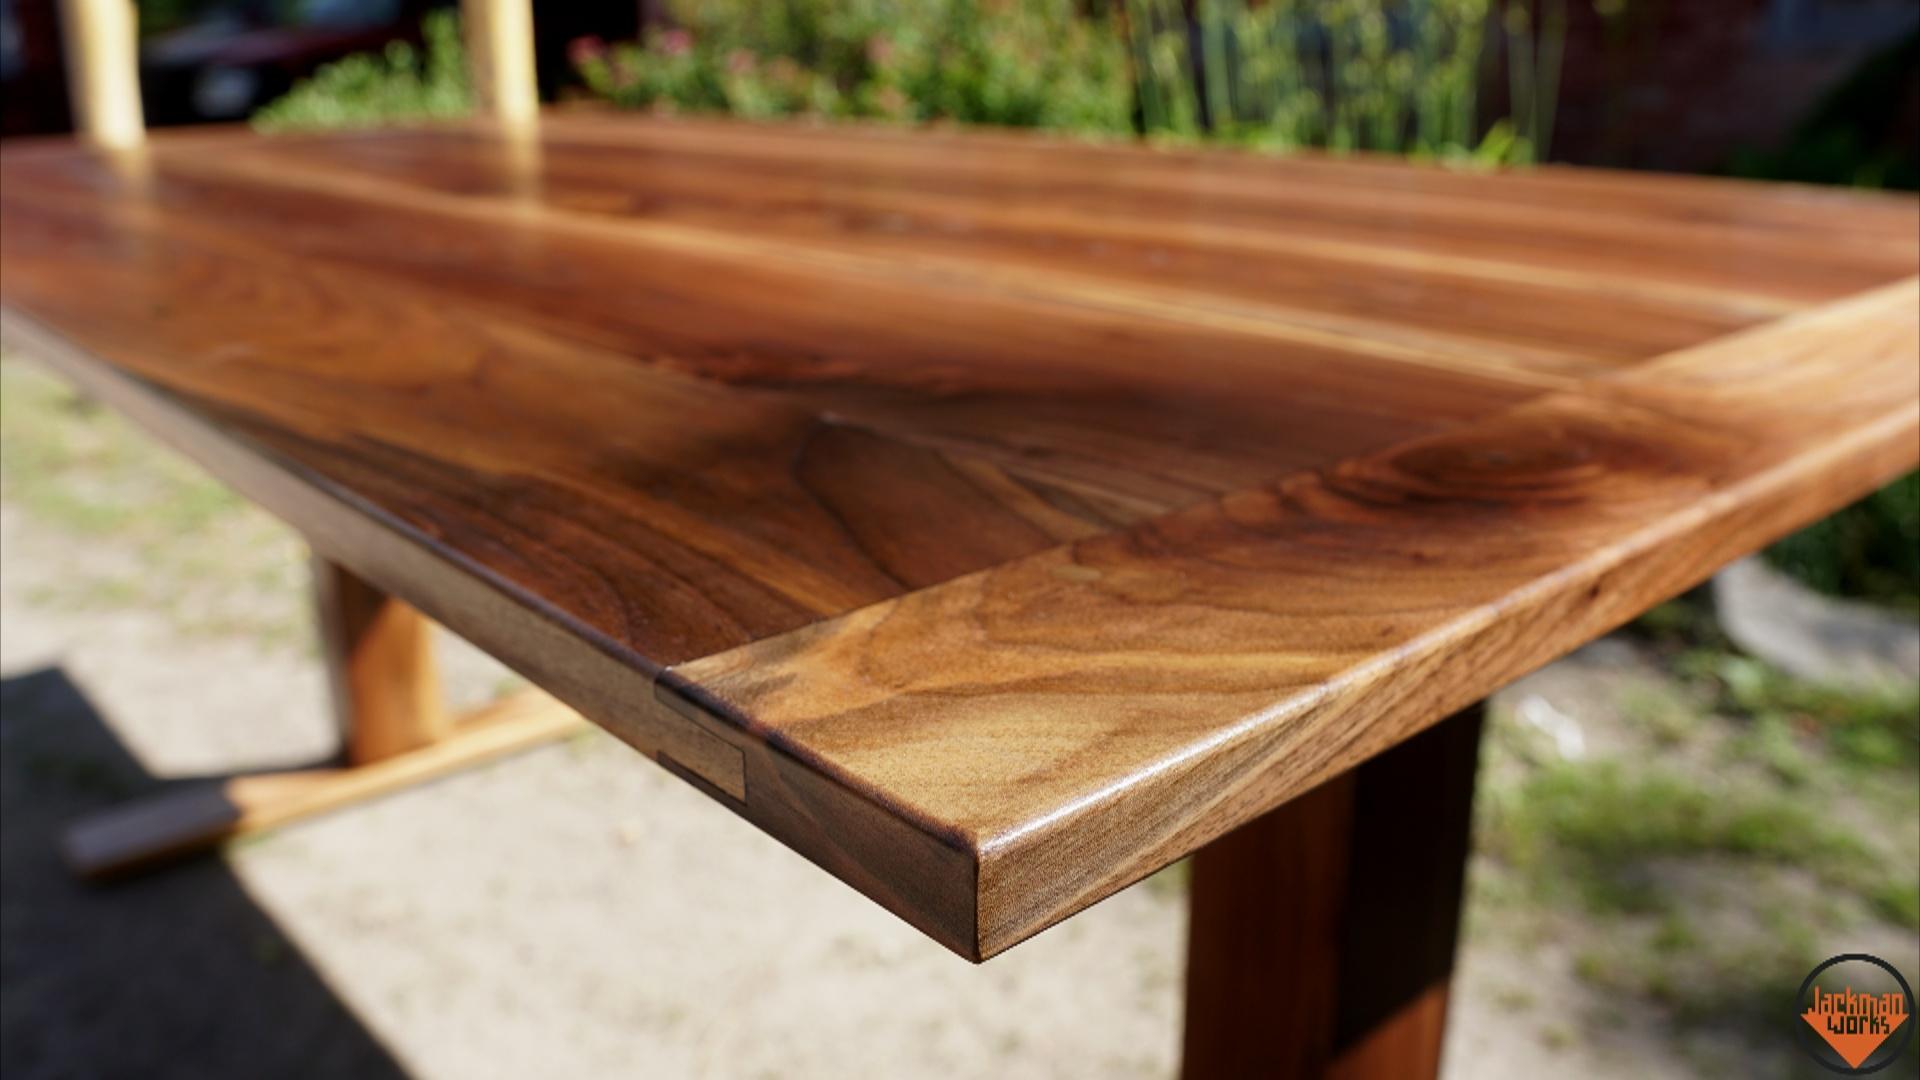 Adjustable Height Sit Stand Walnut Desk 44 Jackman Works